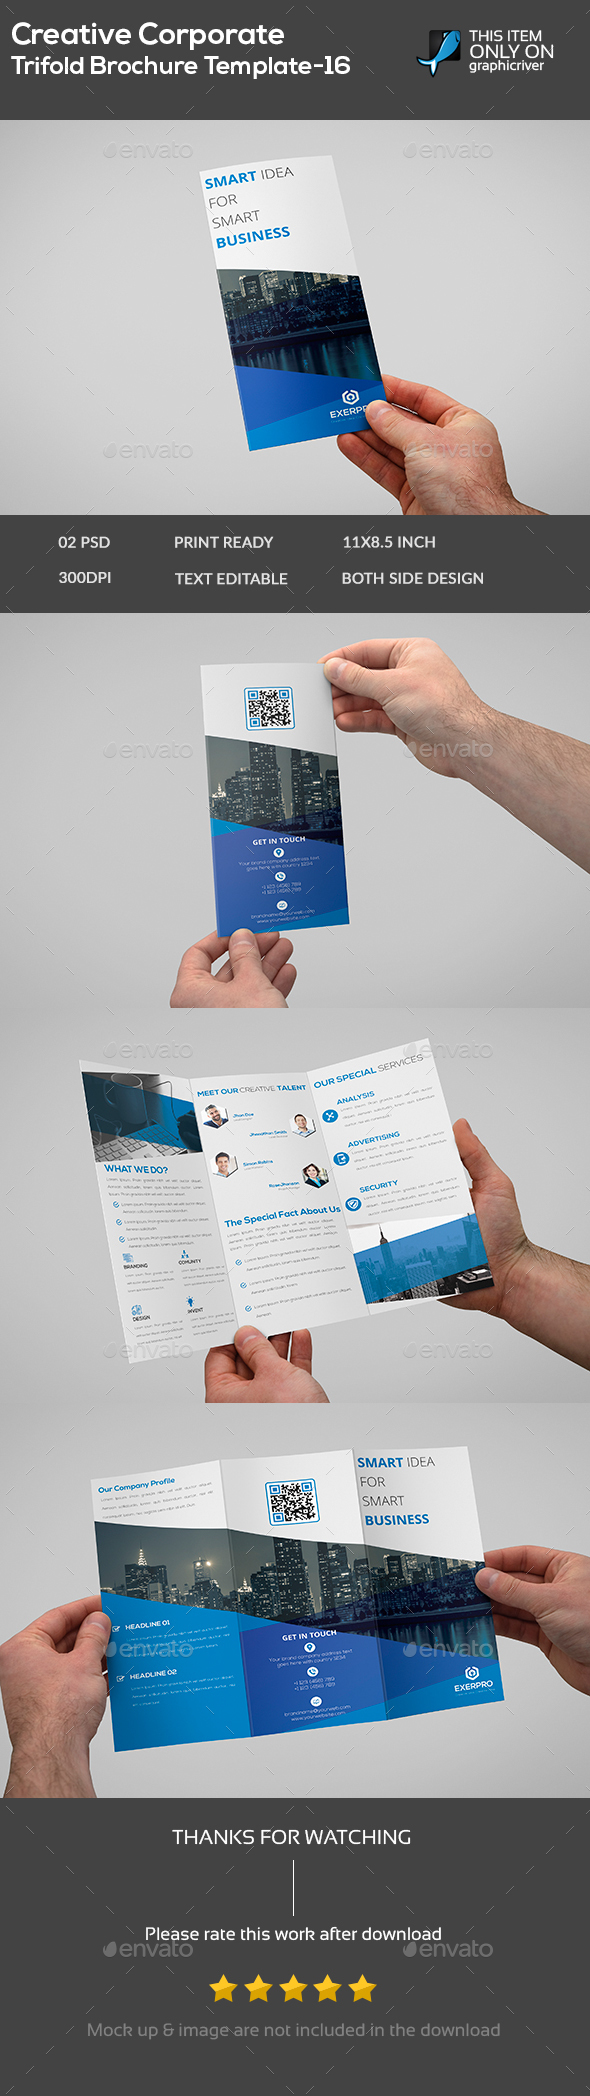 Creative Corporate Trifold Brochure Template -16 - Flyers Print Templates